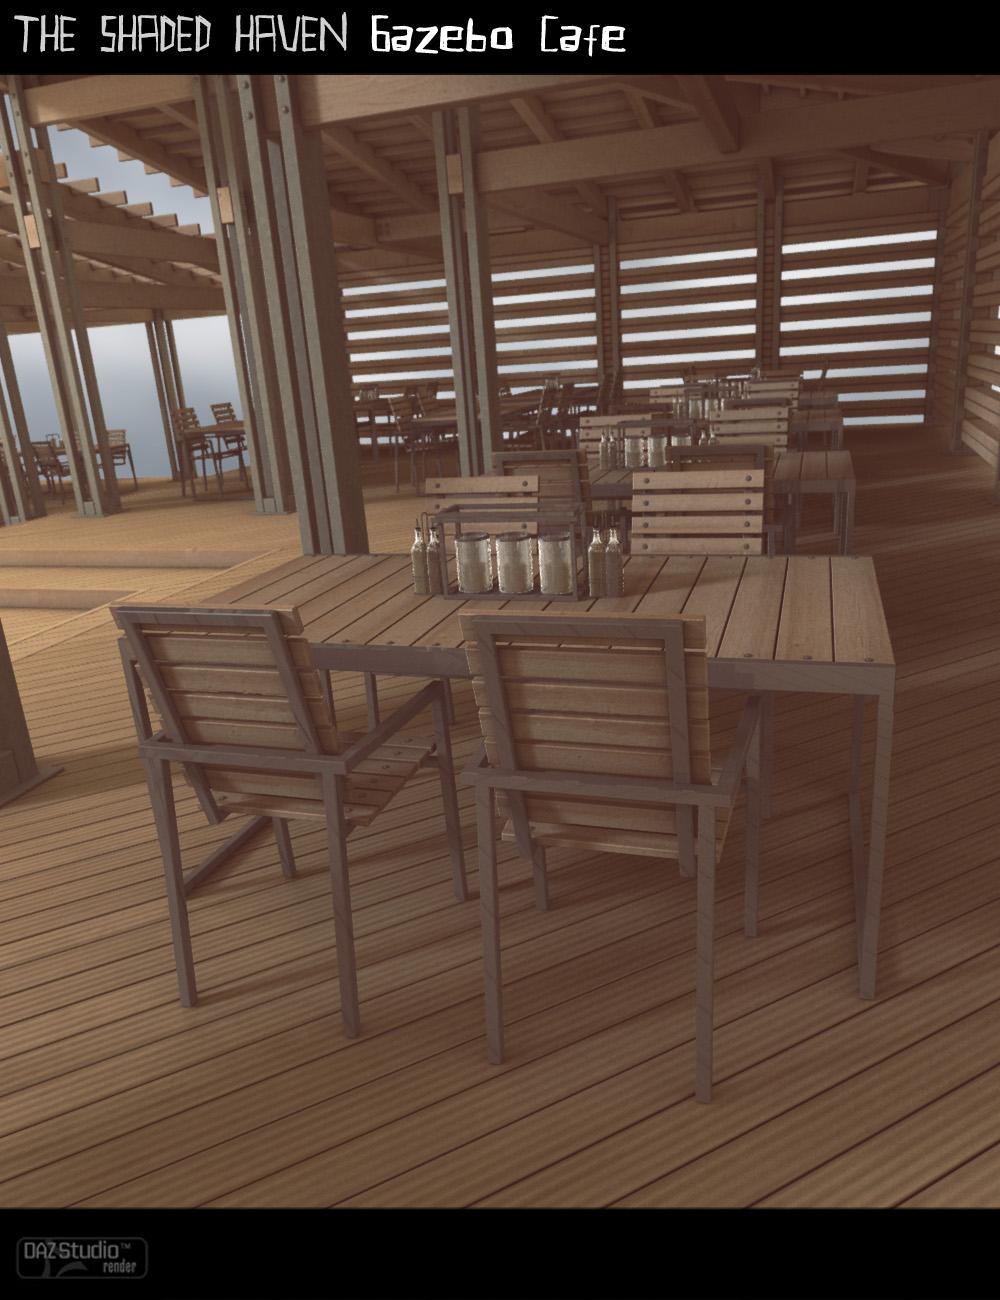 Shaded Haven Gazebo Cafe by: ForbiddenWhispersFWDesign, 3D Models by Daz 3D